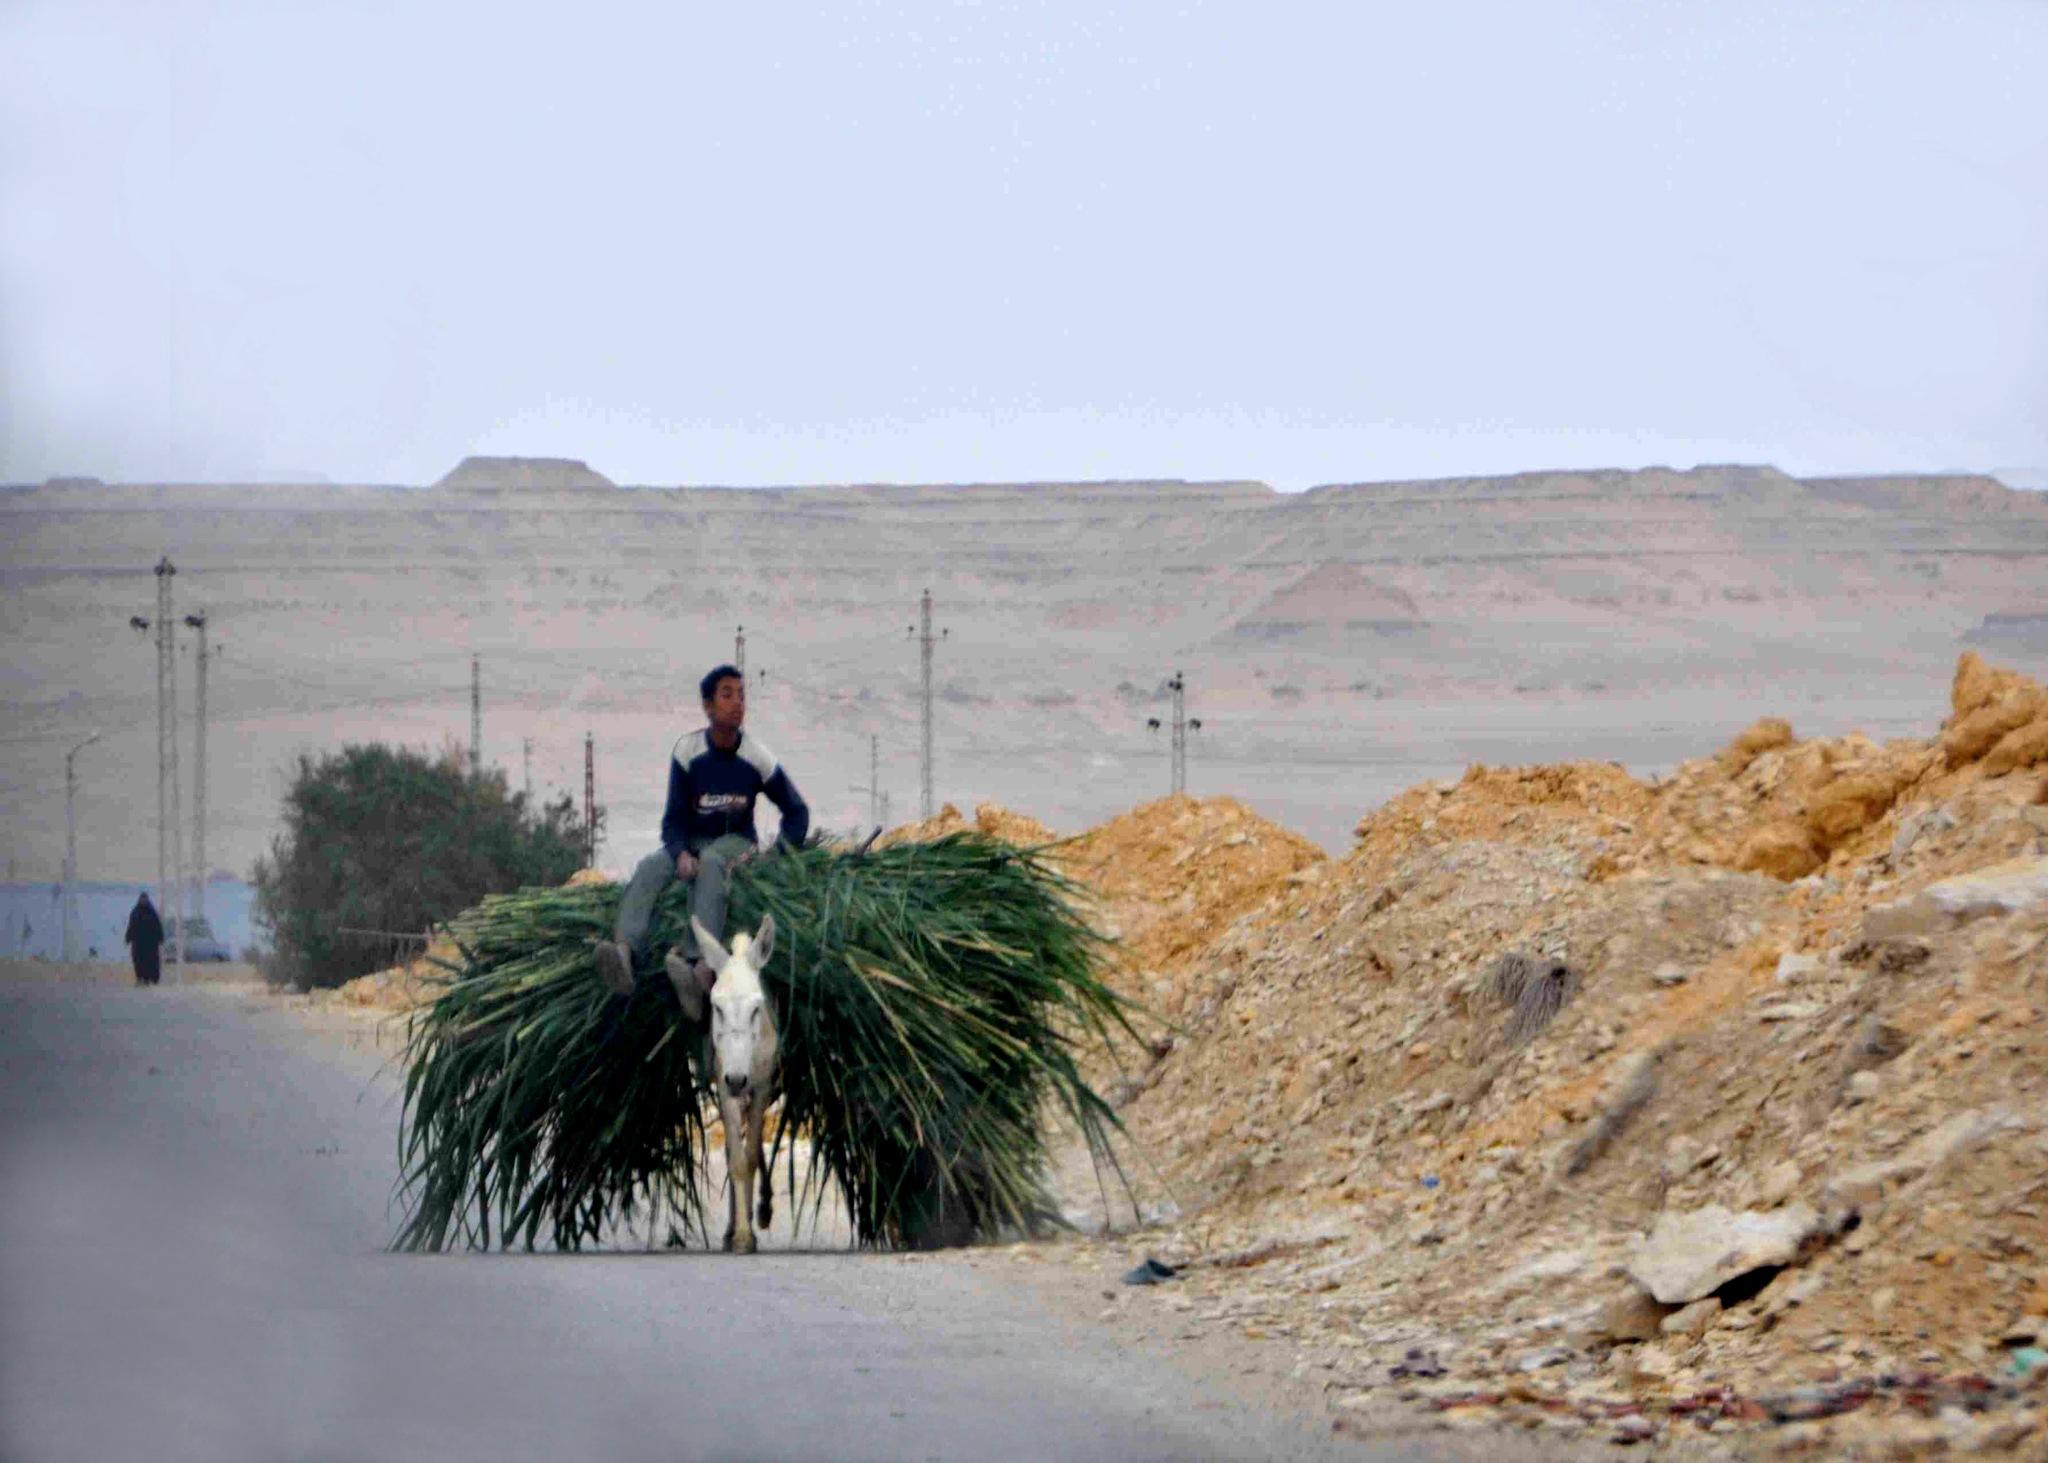 Fayoum, Egypt by kfboland125